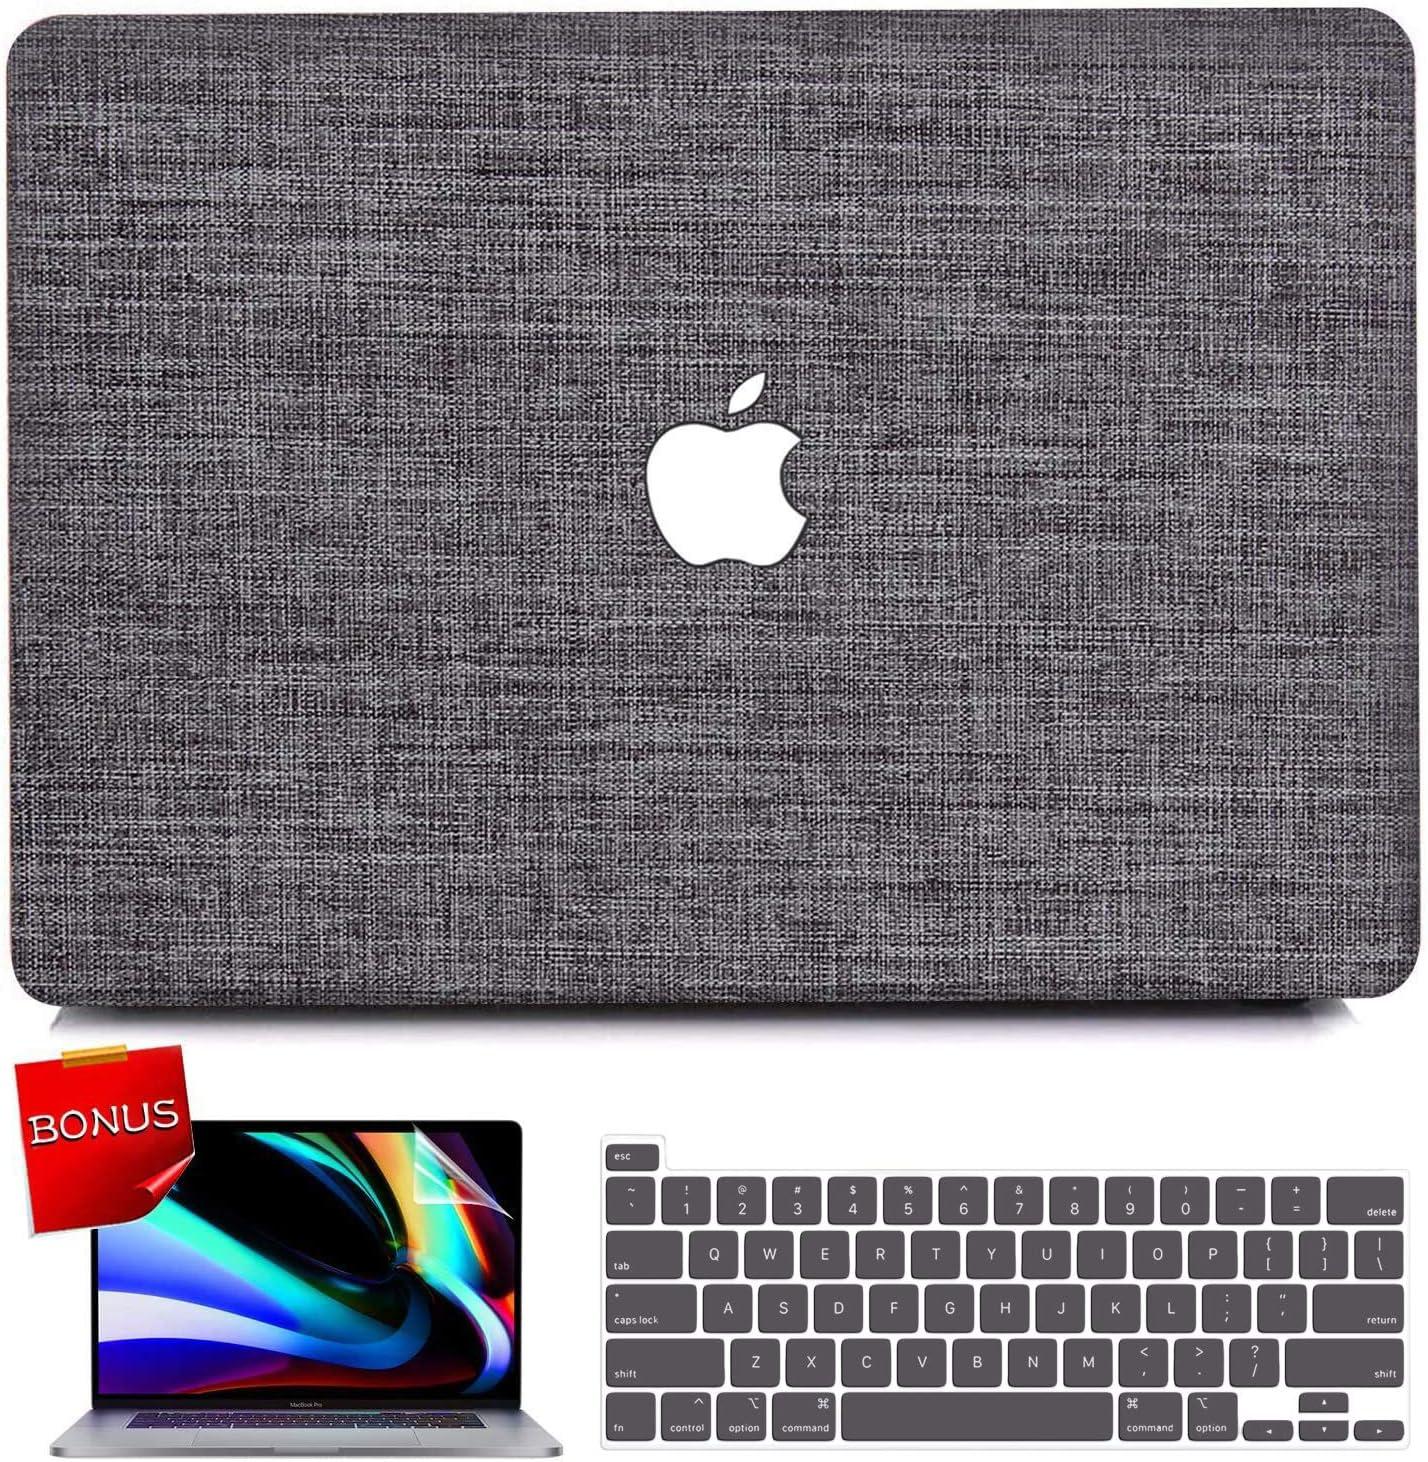 iPAPA MacBook Pro 13 inch Case 2020 2019 2018 2017 2016 Release A2338 M1 A2251 A2289 A2159 A1708 A1706 A1989, Fabric Hard Shell Cover + Keyboard Cover + Screen Skin, MacBook Pro 2020 M1 Case Touch Bar